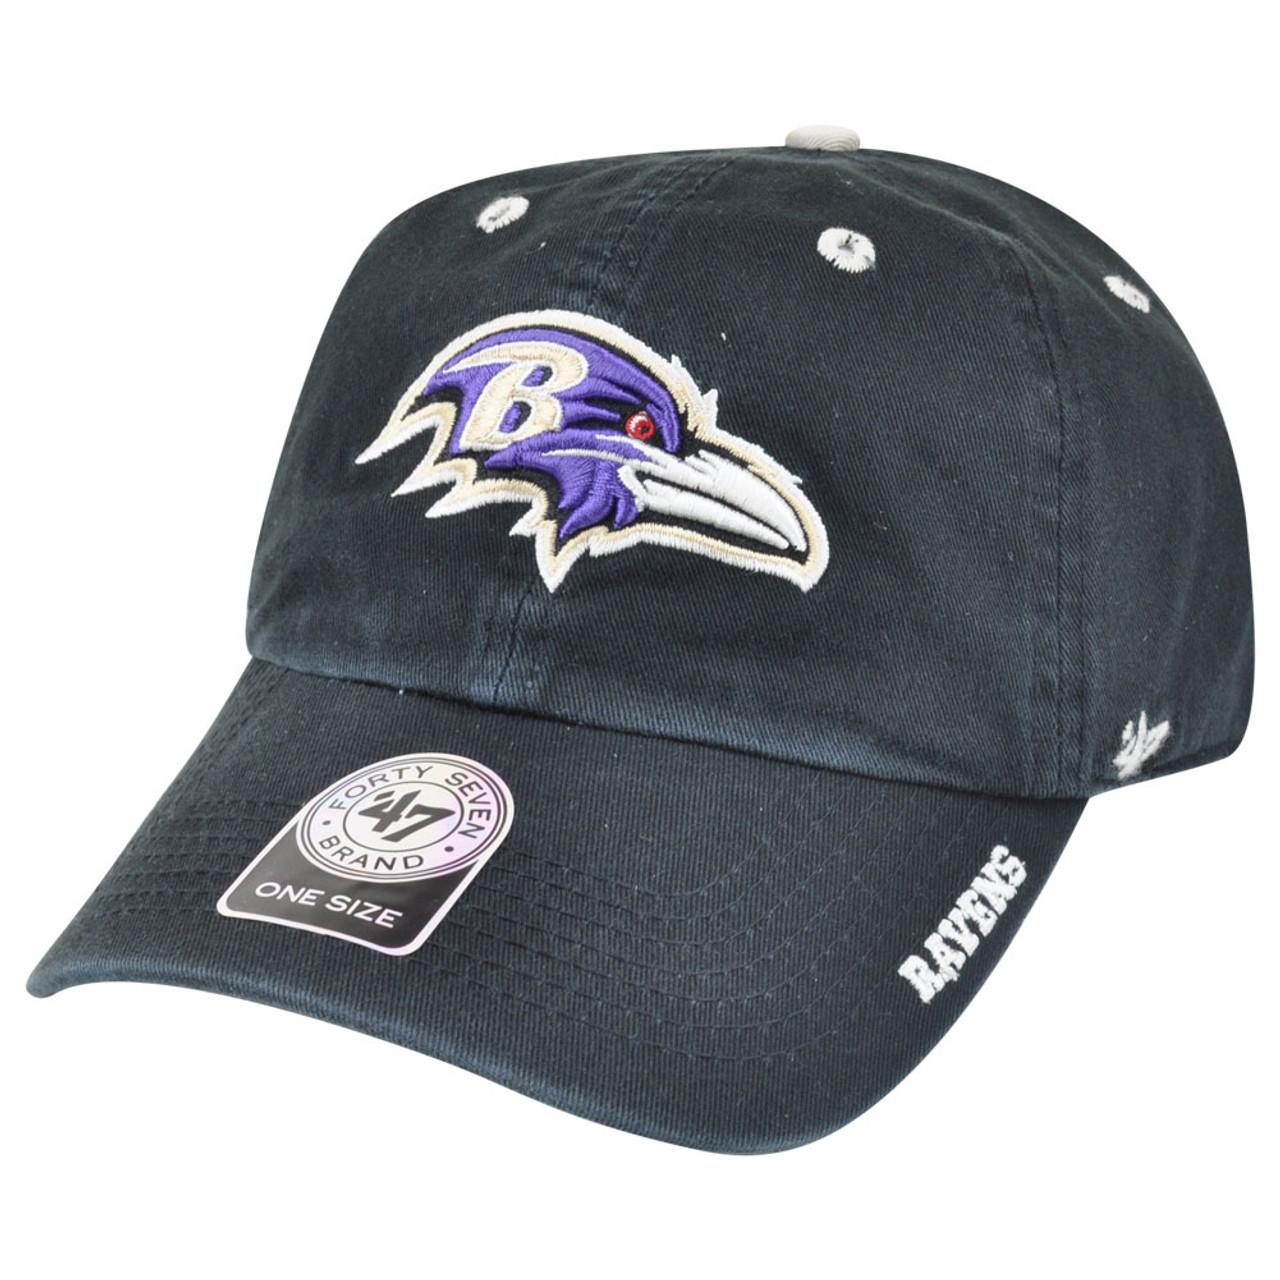 12525cf0fc8add '47 Brand NFL Baltimore Ravens Ice Garment Wash Adjustable Snap Buckle Hat  Cap - Cap Store Online.com